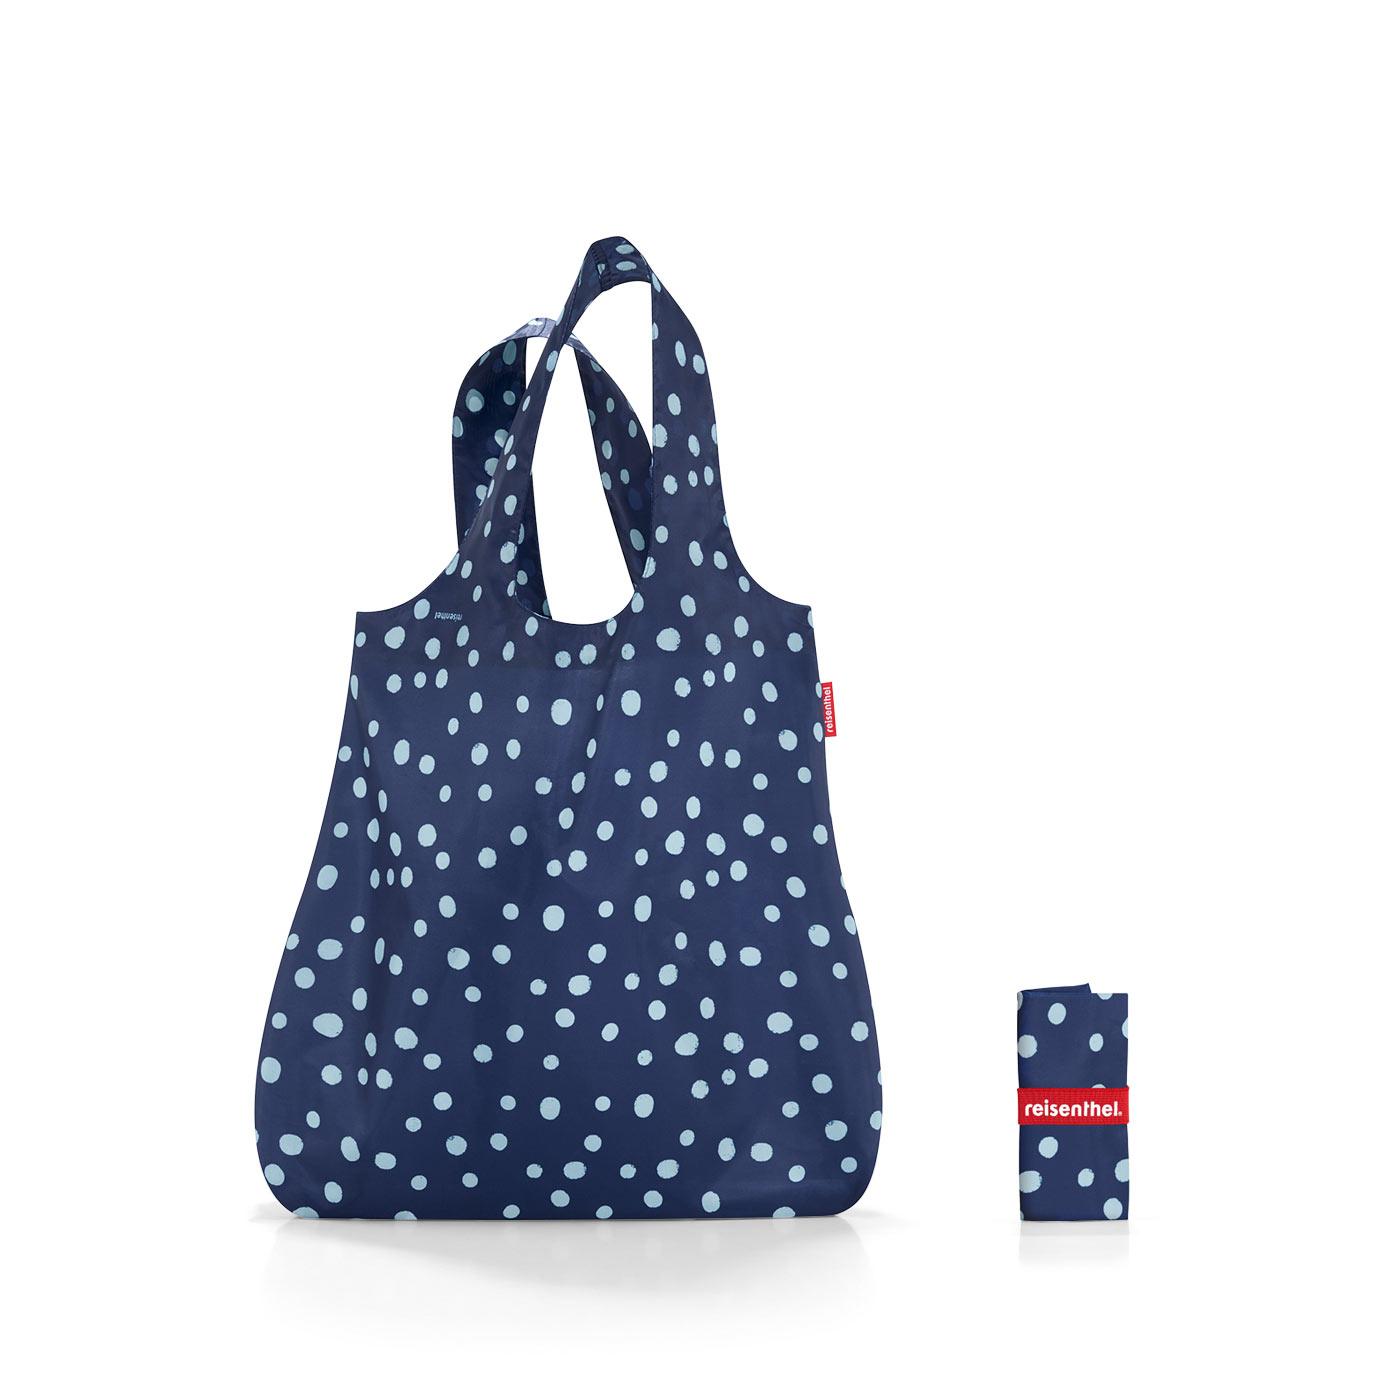 Reisenthel Mini Maxi Shopper Einkaufsbeutel Navy